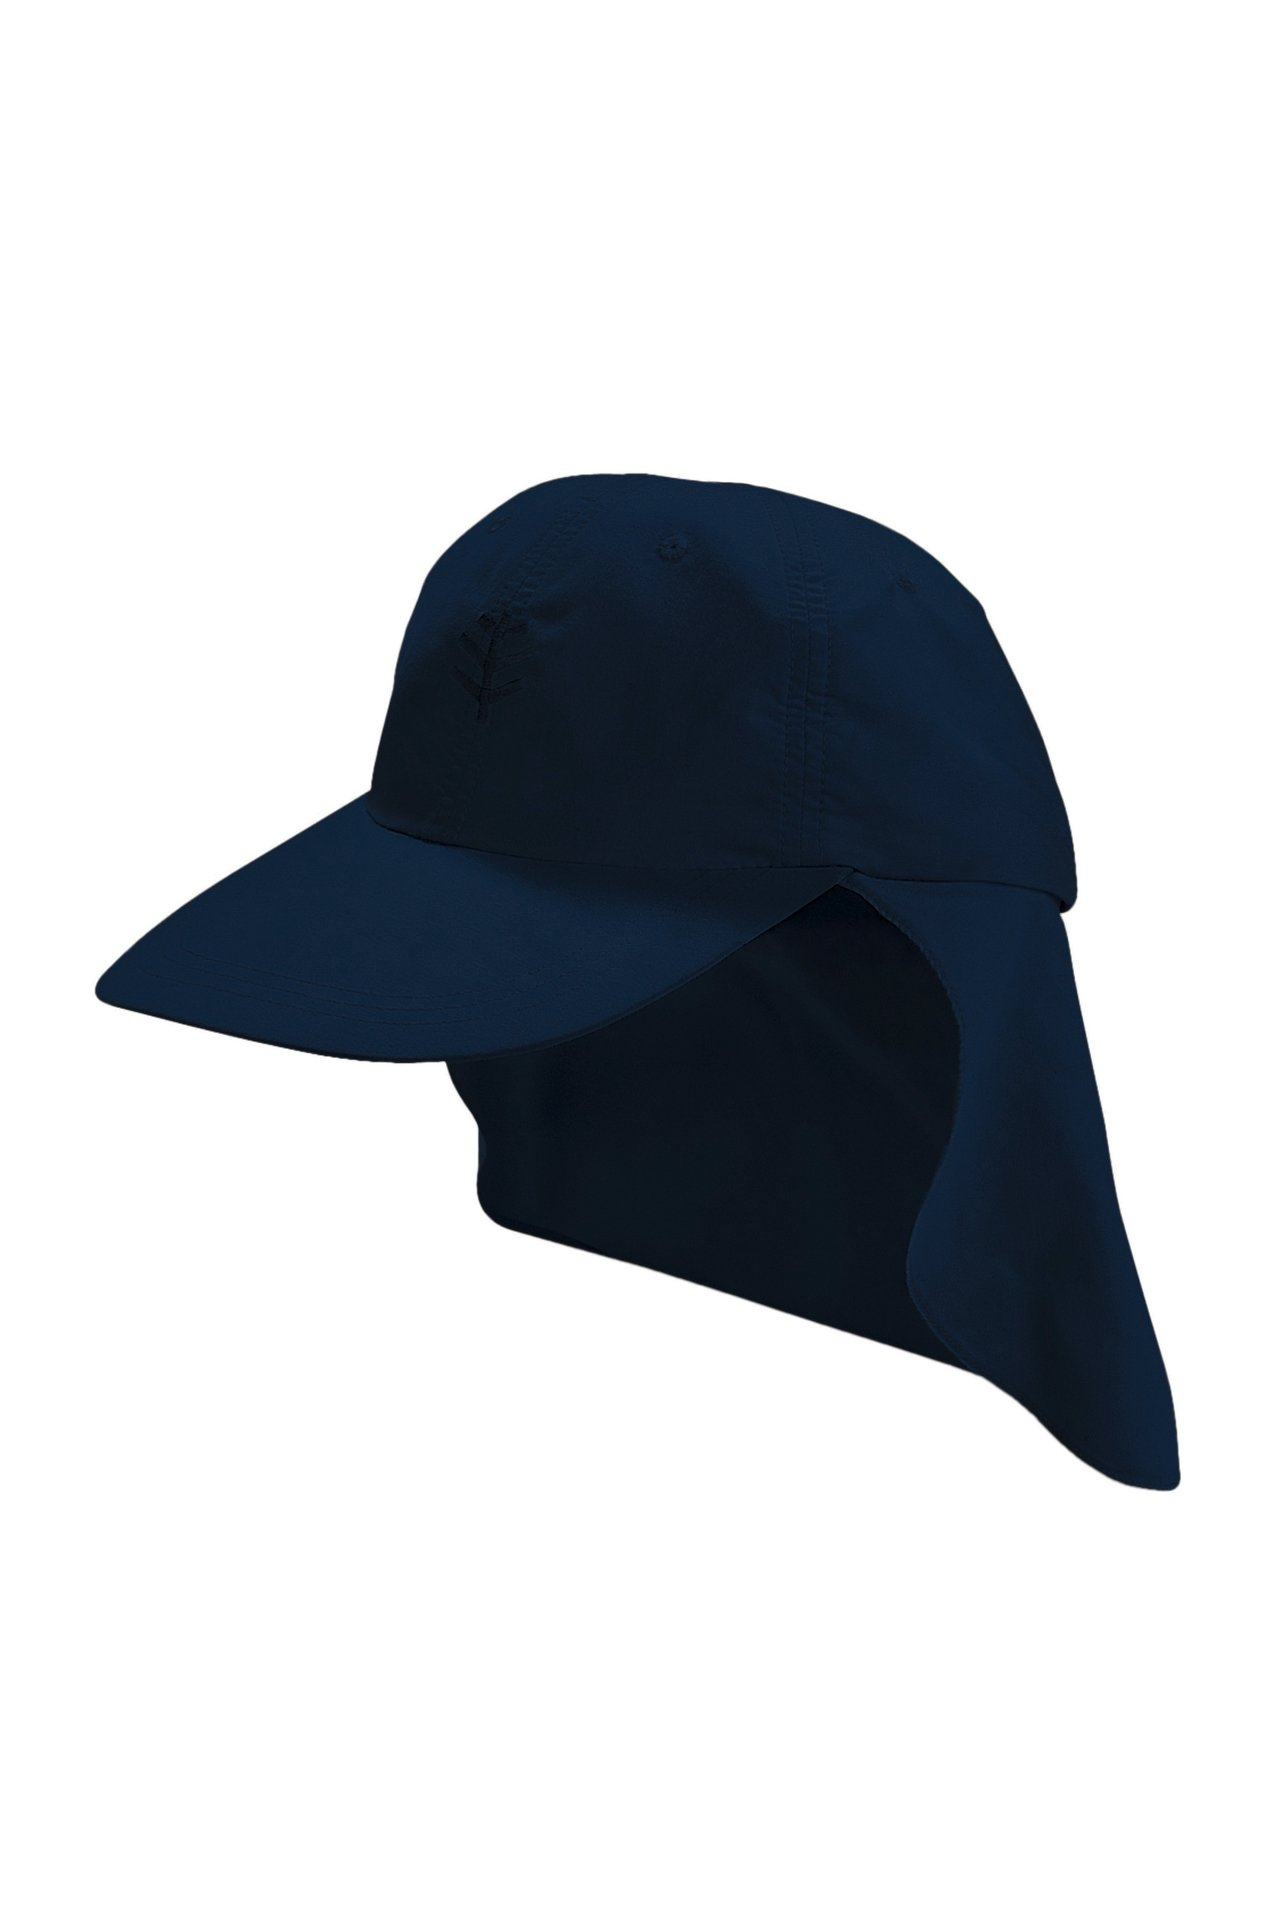 Coolibar UPF 50 Men/'s Women/'s All Sport Hat